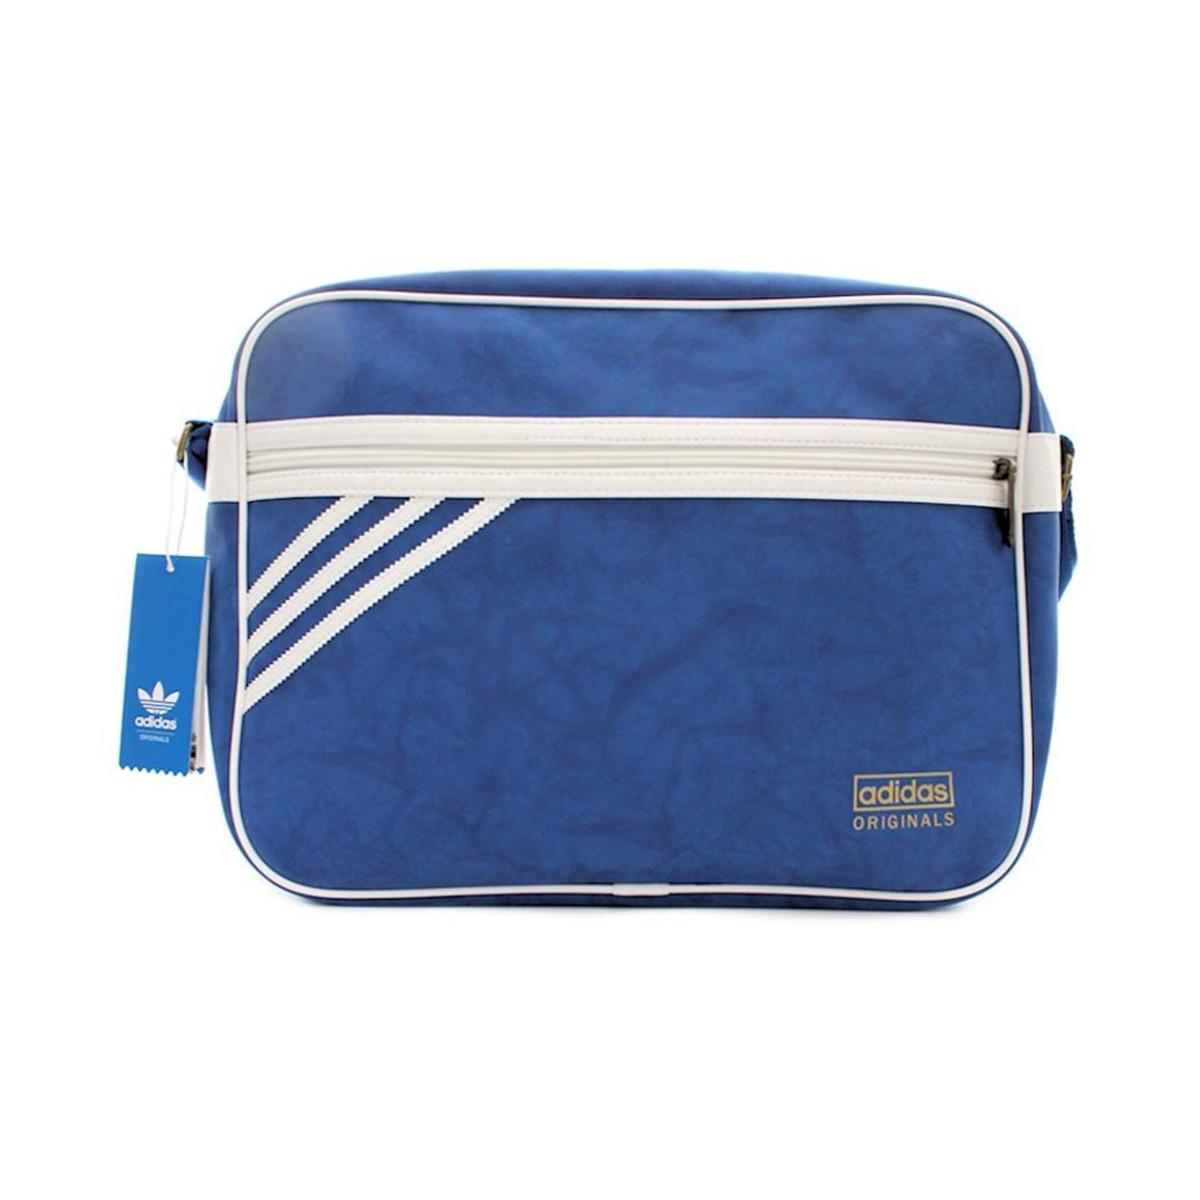 e480c5a98d28 adidas Airliner Suede Men s Messenger Bag In Blue in Blue for Men - Lyst